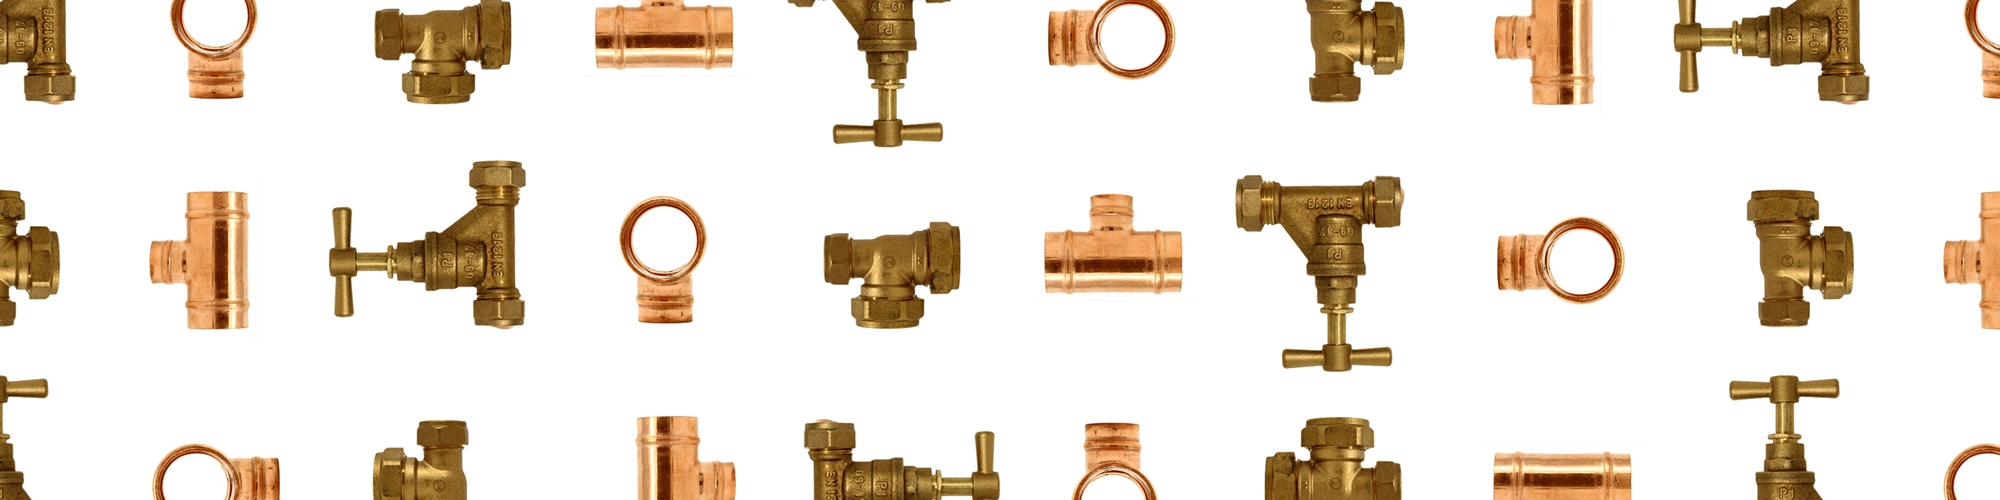 brass fittings, pipe fittings, plumbing supplies, plumbing chester, plumbing shrewsbury